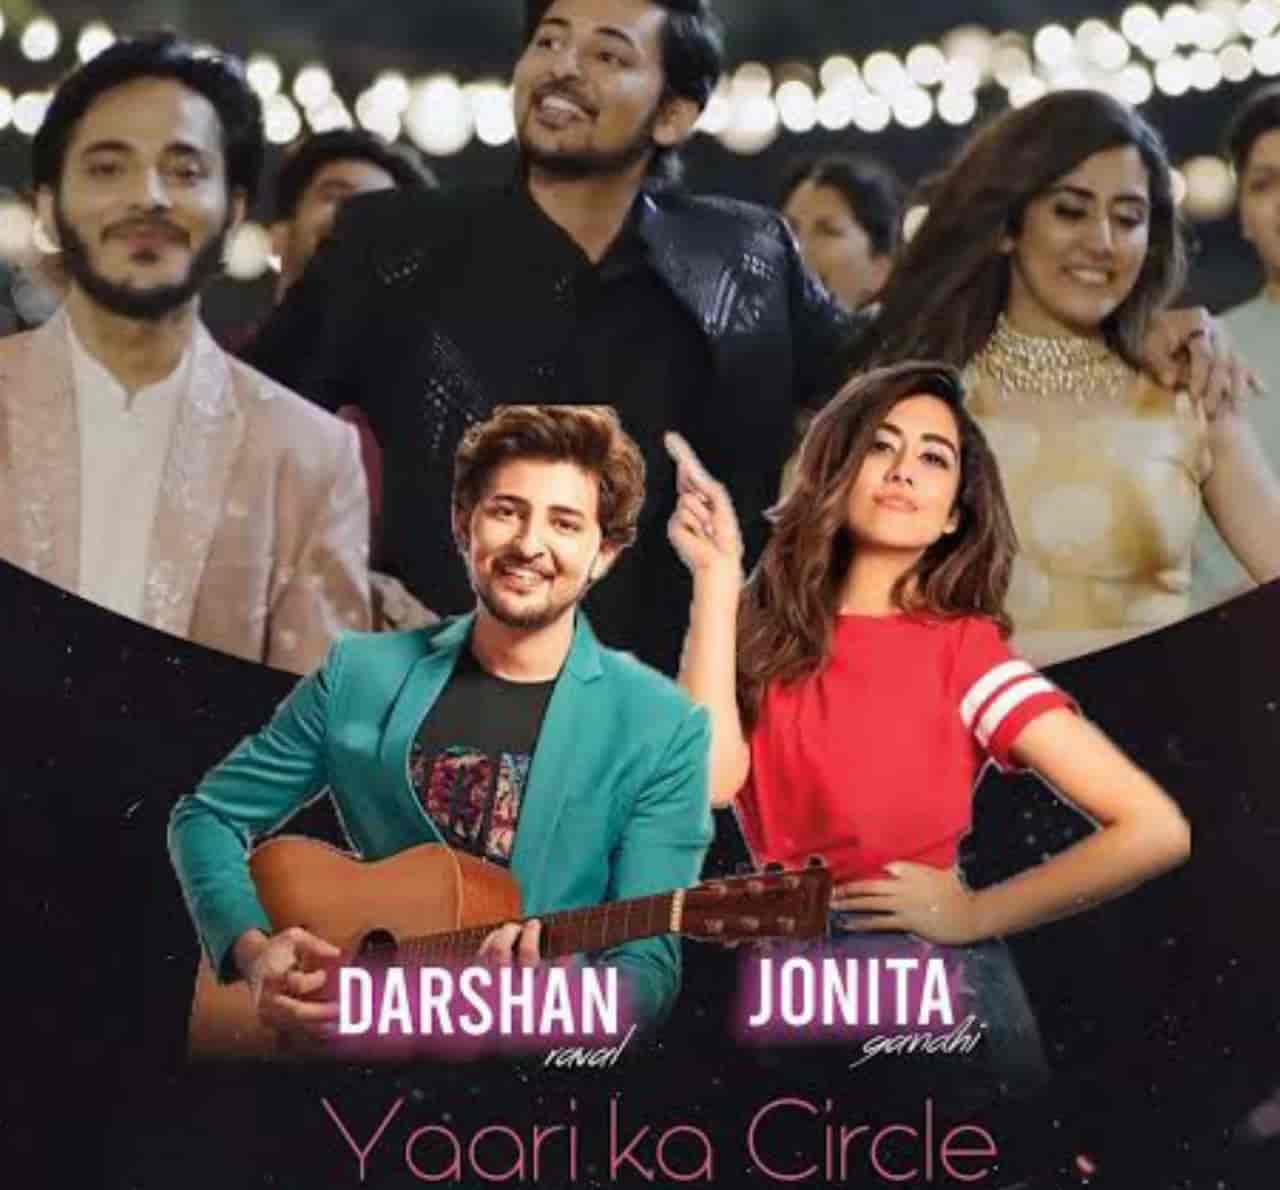 Yaari Ka Circle Song Lyrics, Sung By Darshan Raval and Jonita Gandhi.